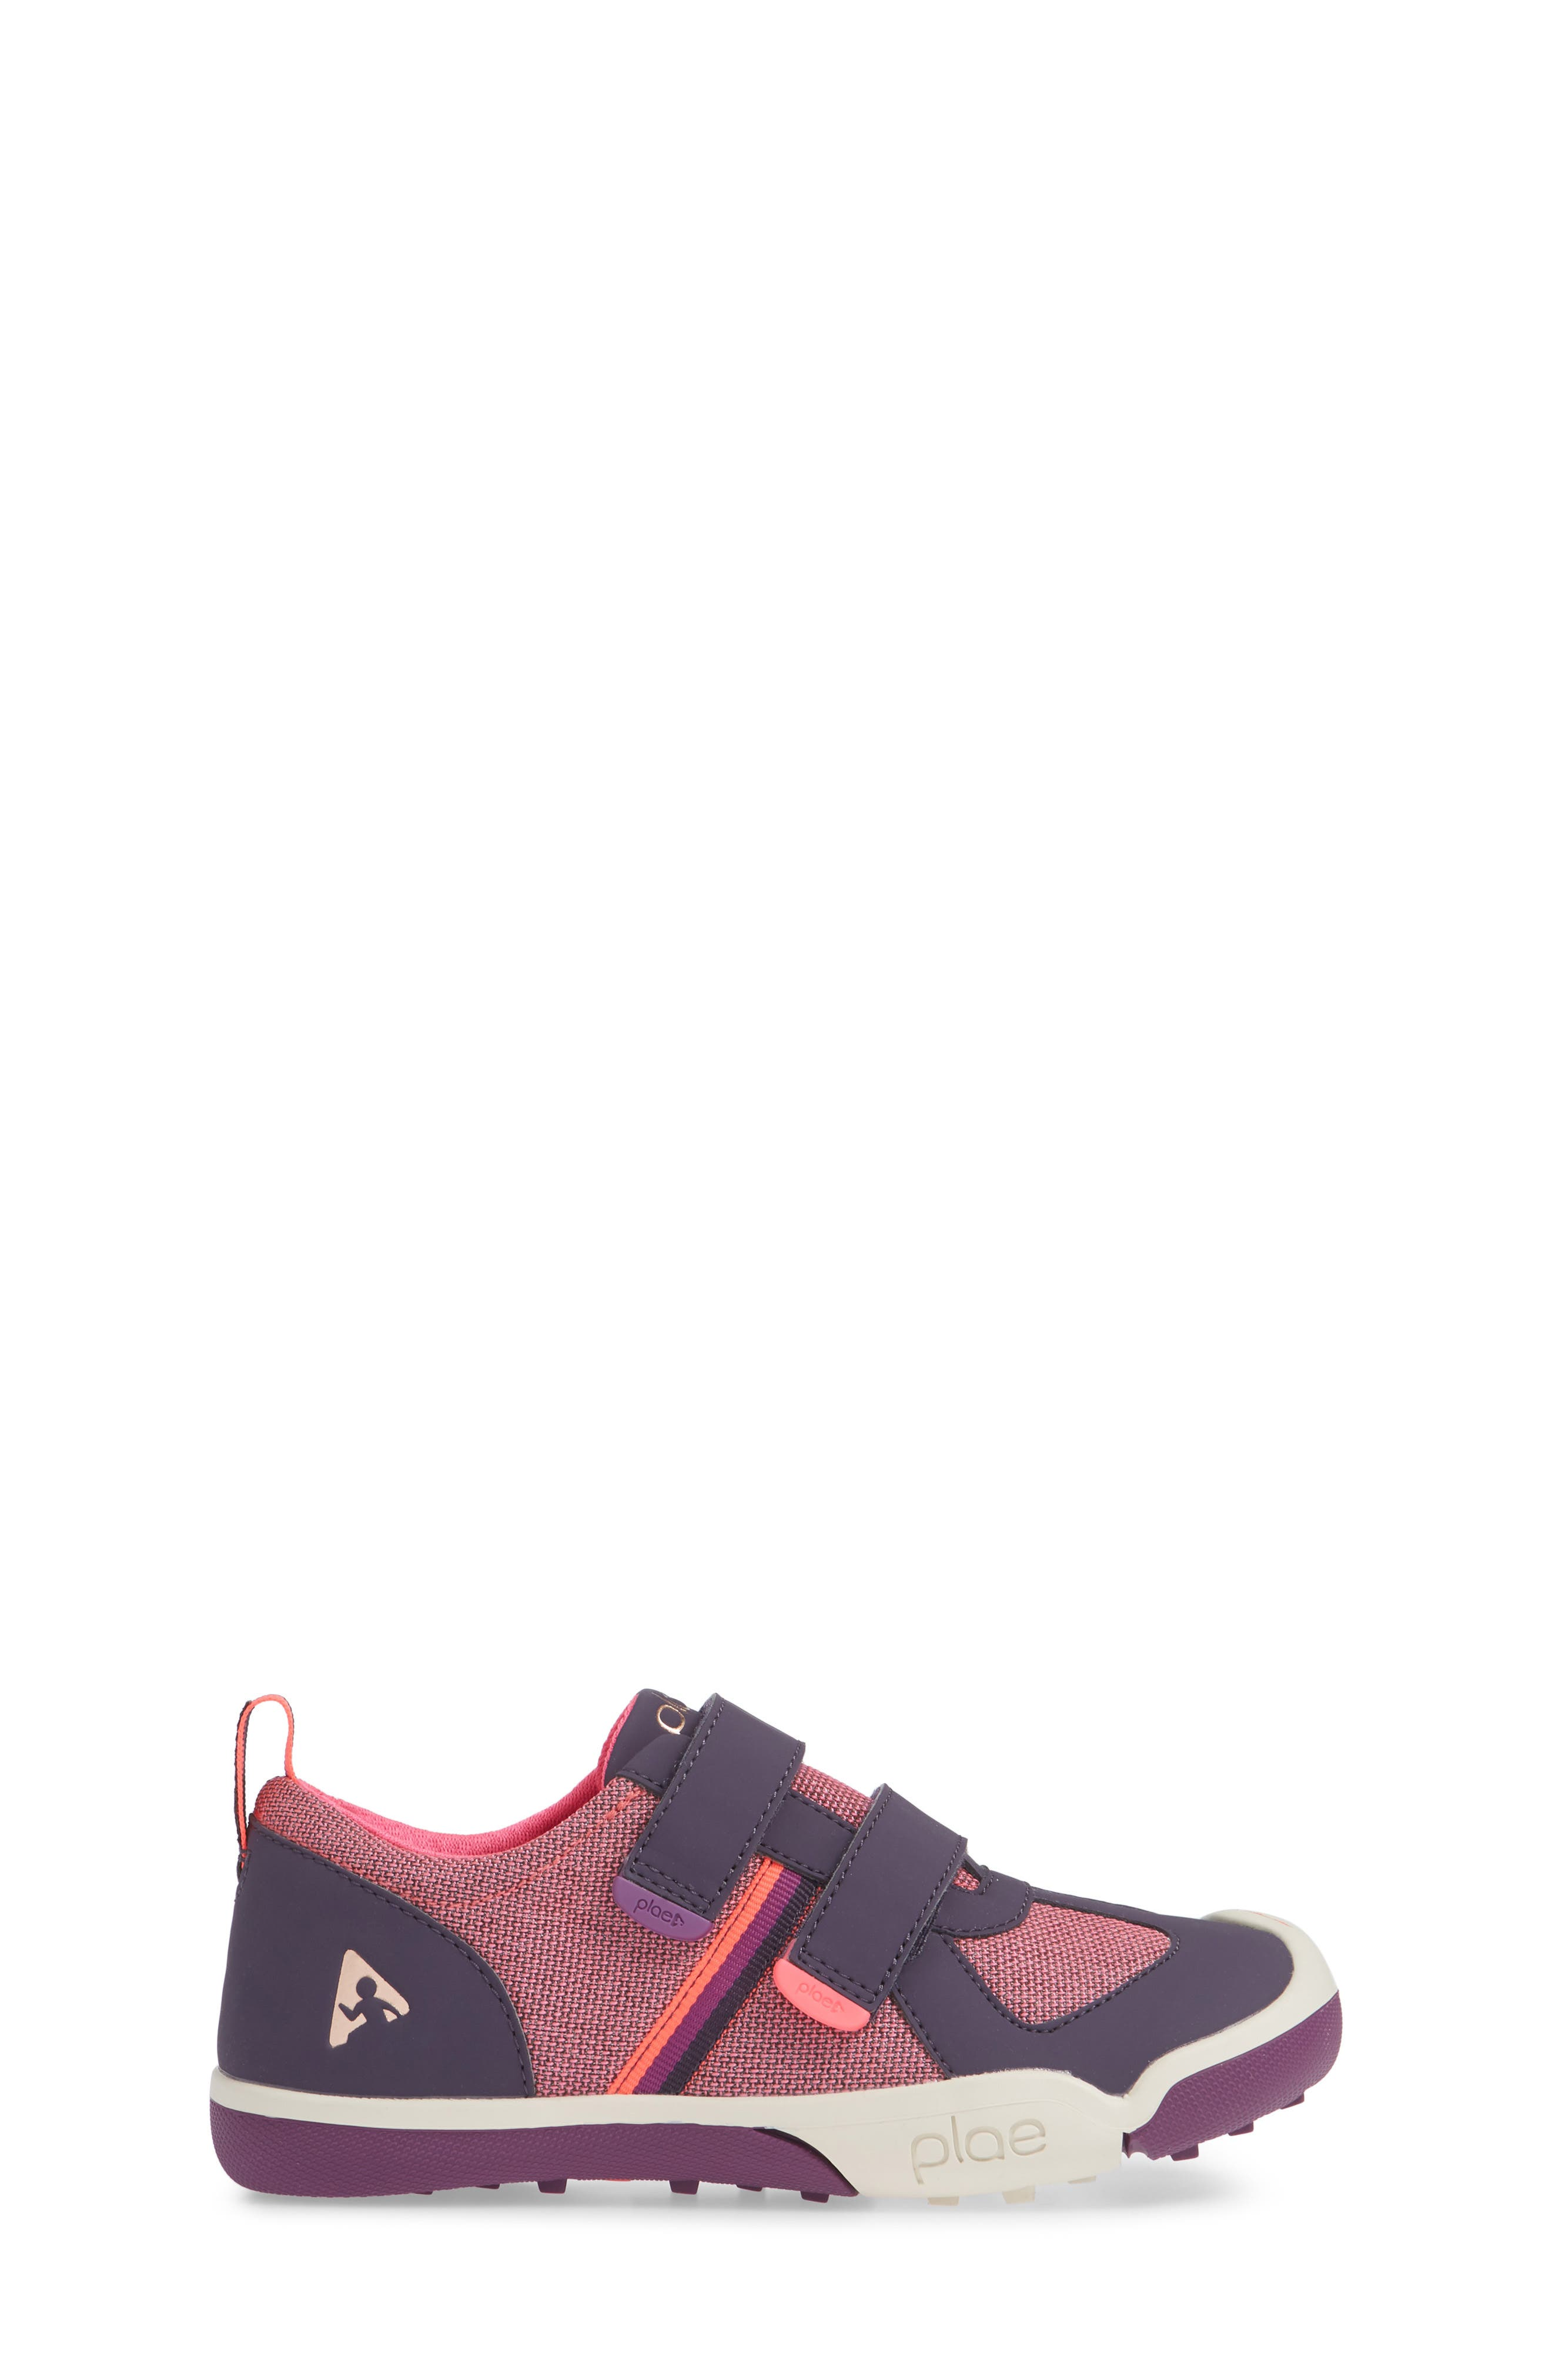 Charlie Customizable Waterproof Sneaker,                             Alternate thumbnail 3, color,                             MYSTIC BERRY